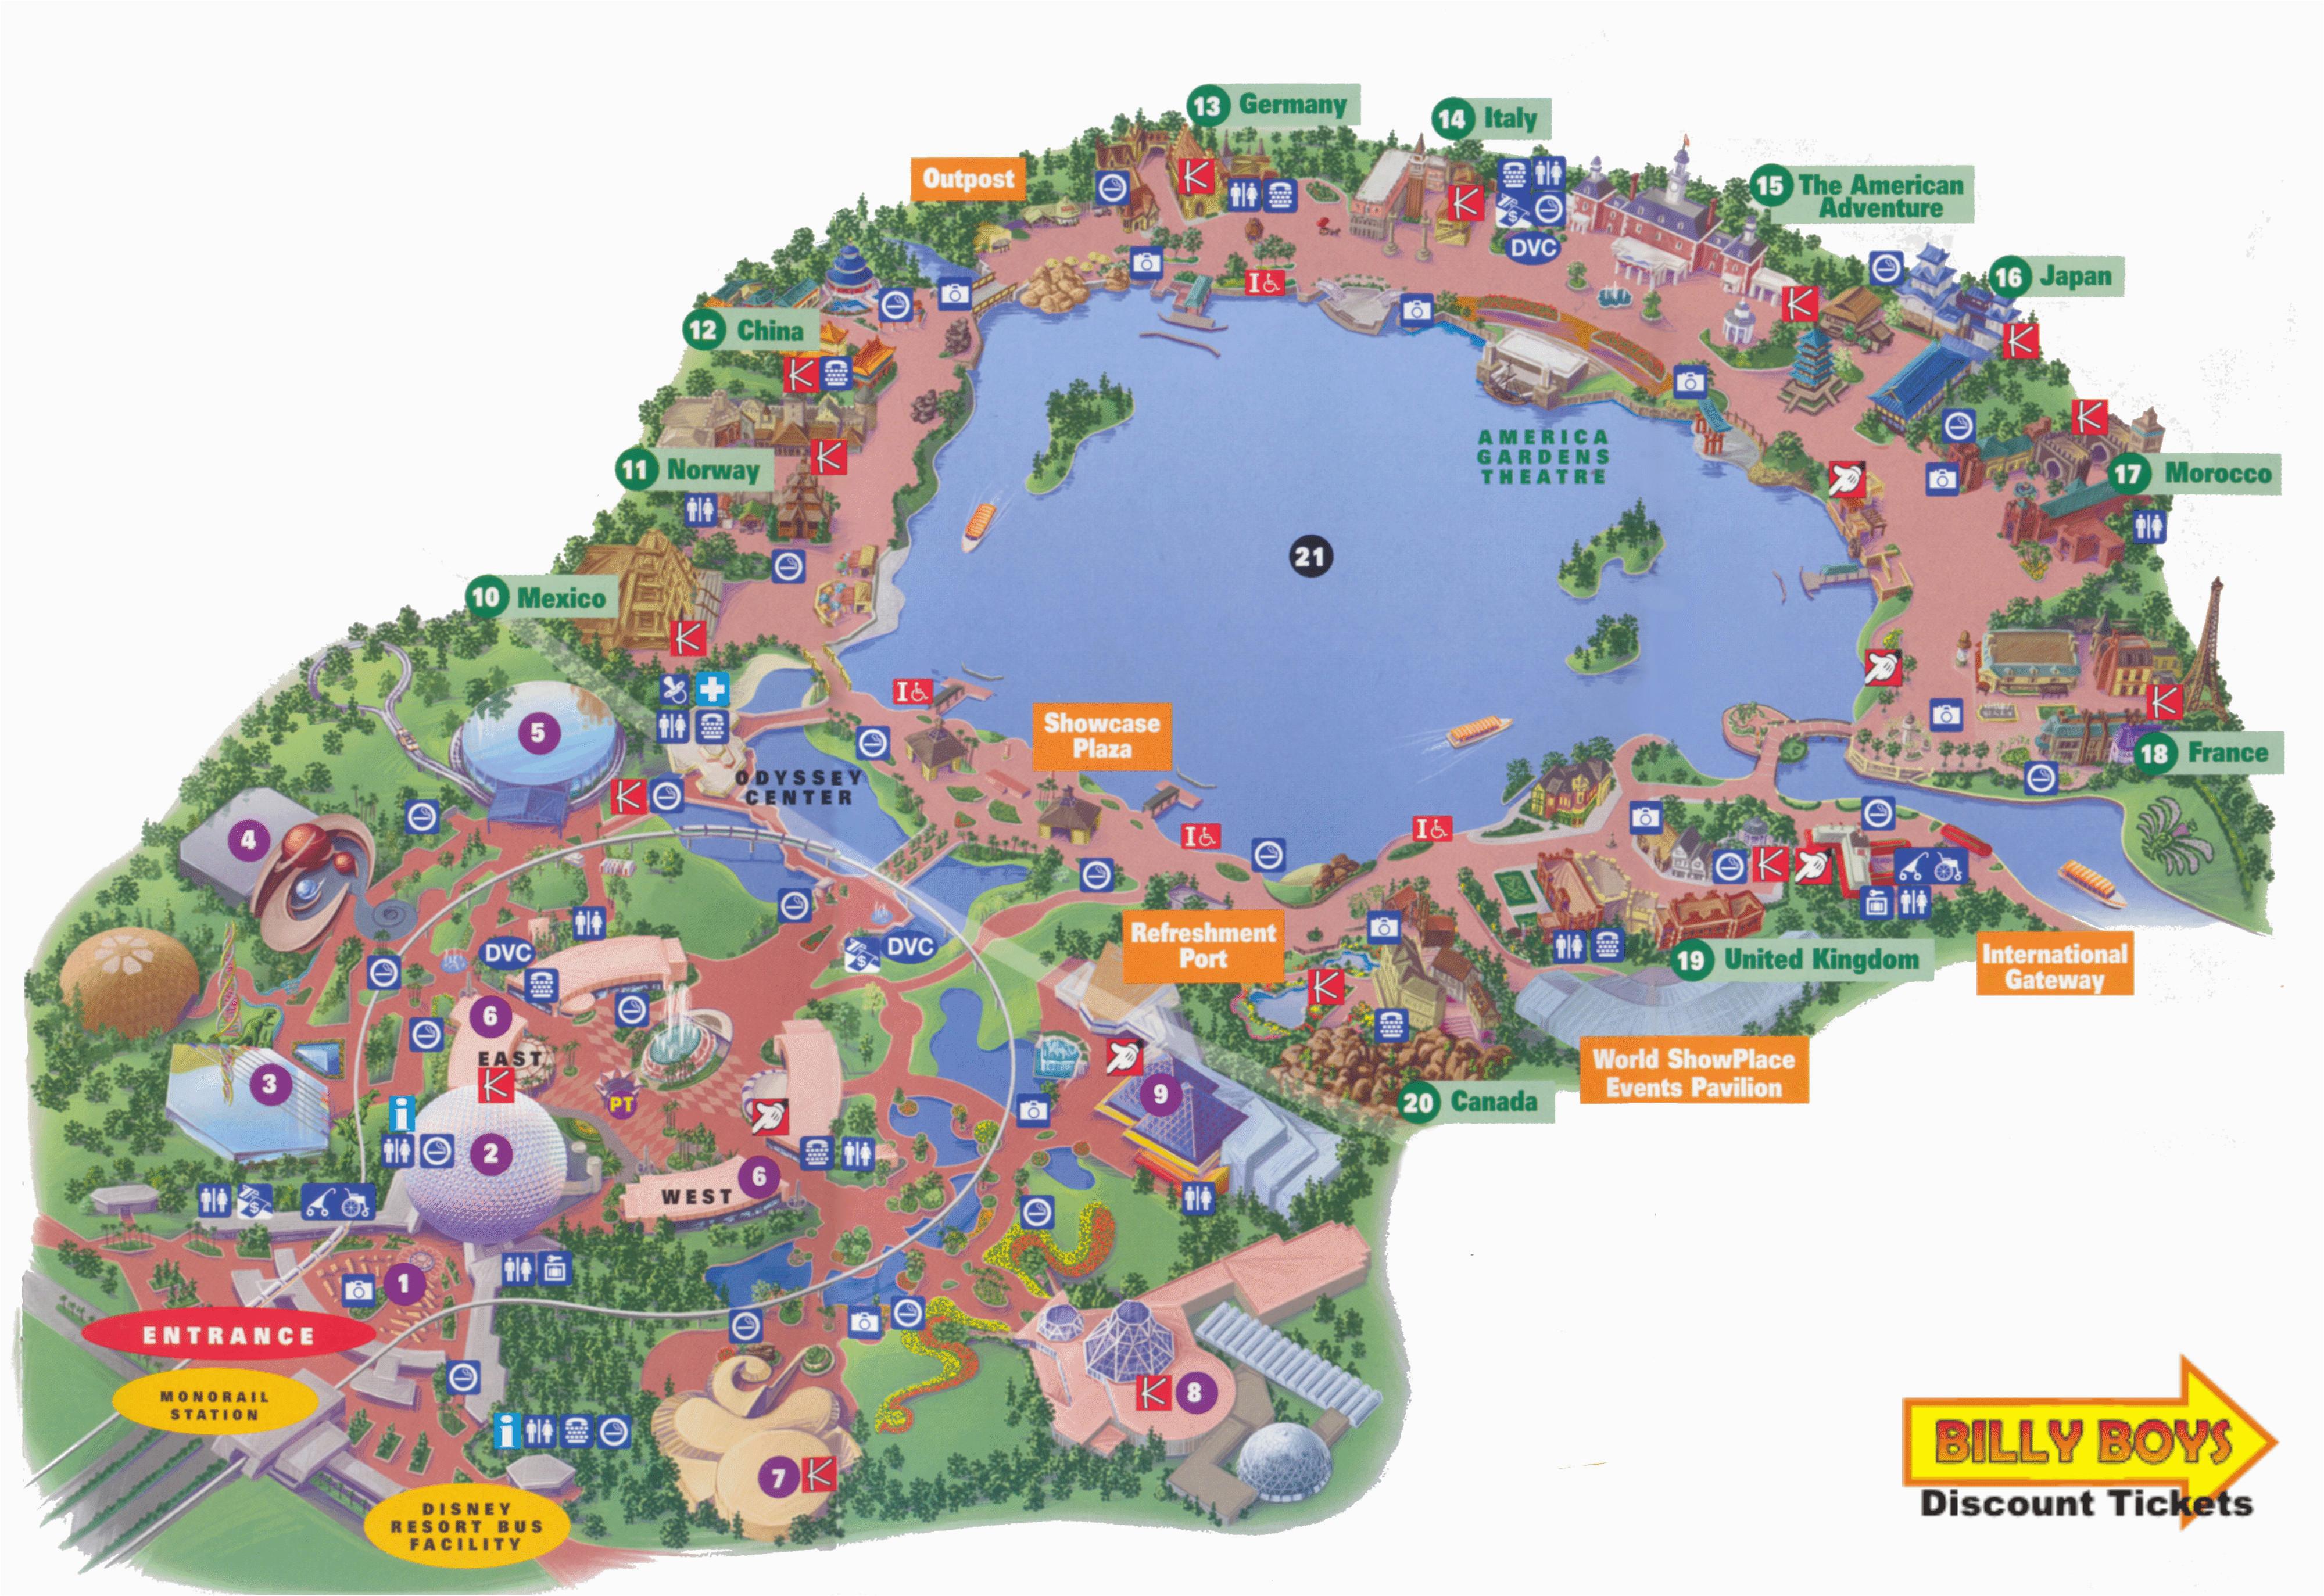 Map Of California Disneyland.California Disneyland Map Map Of Garden